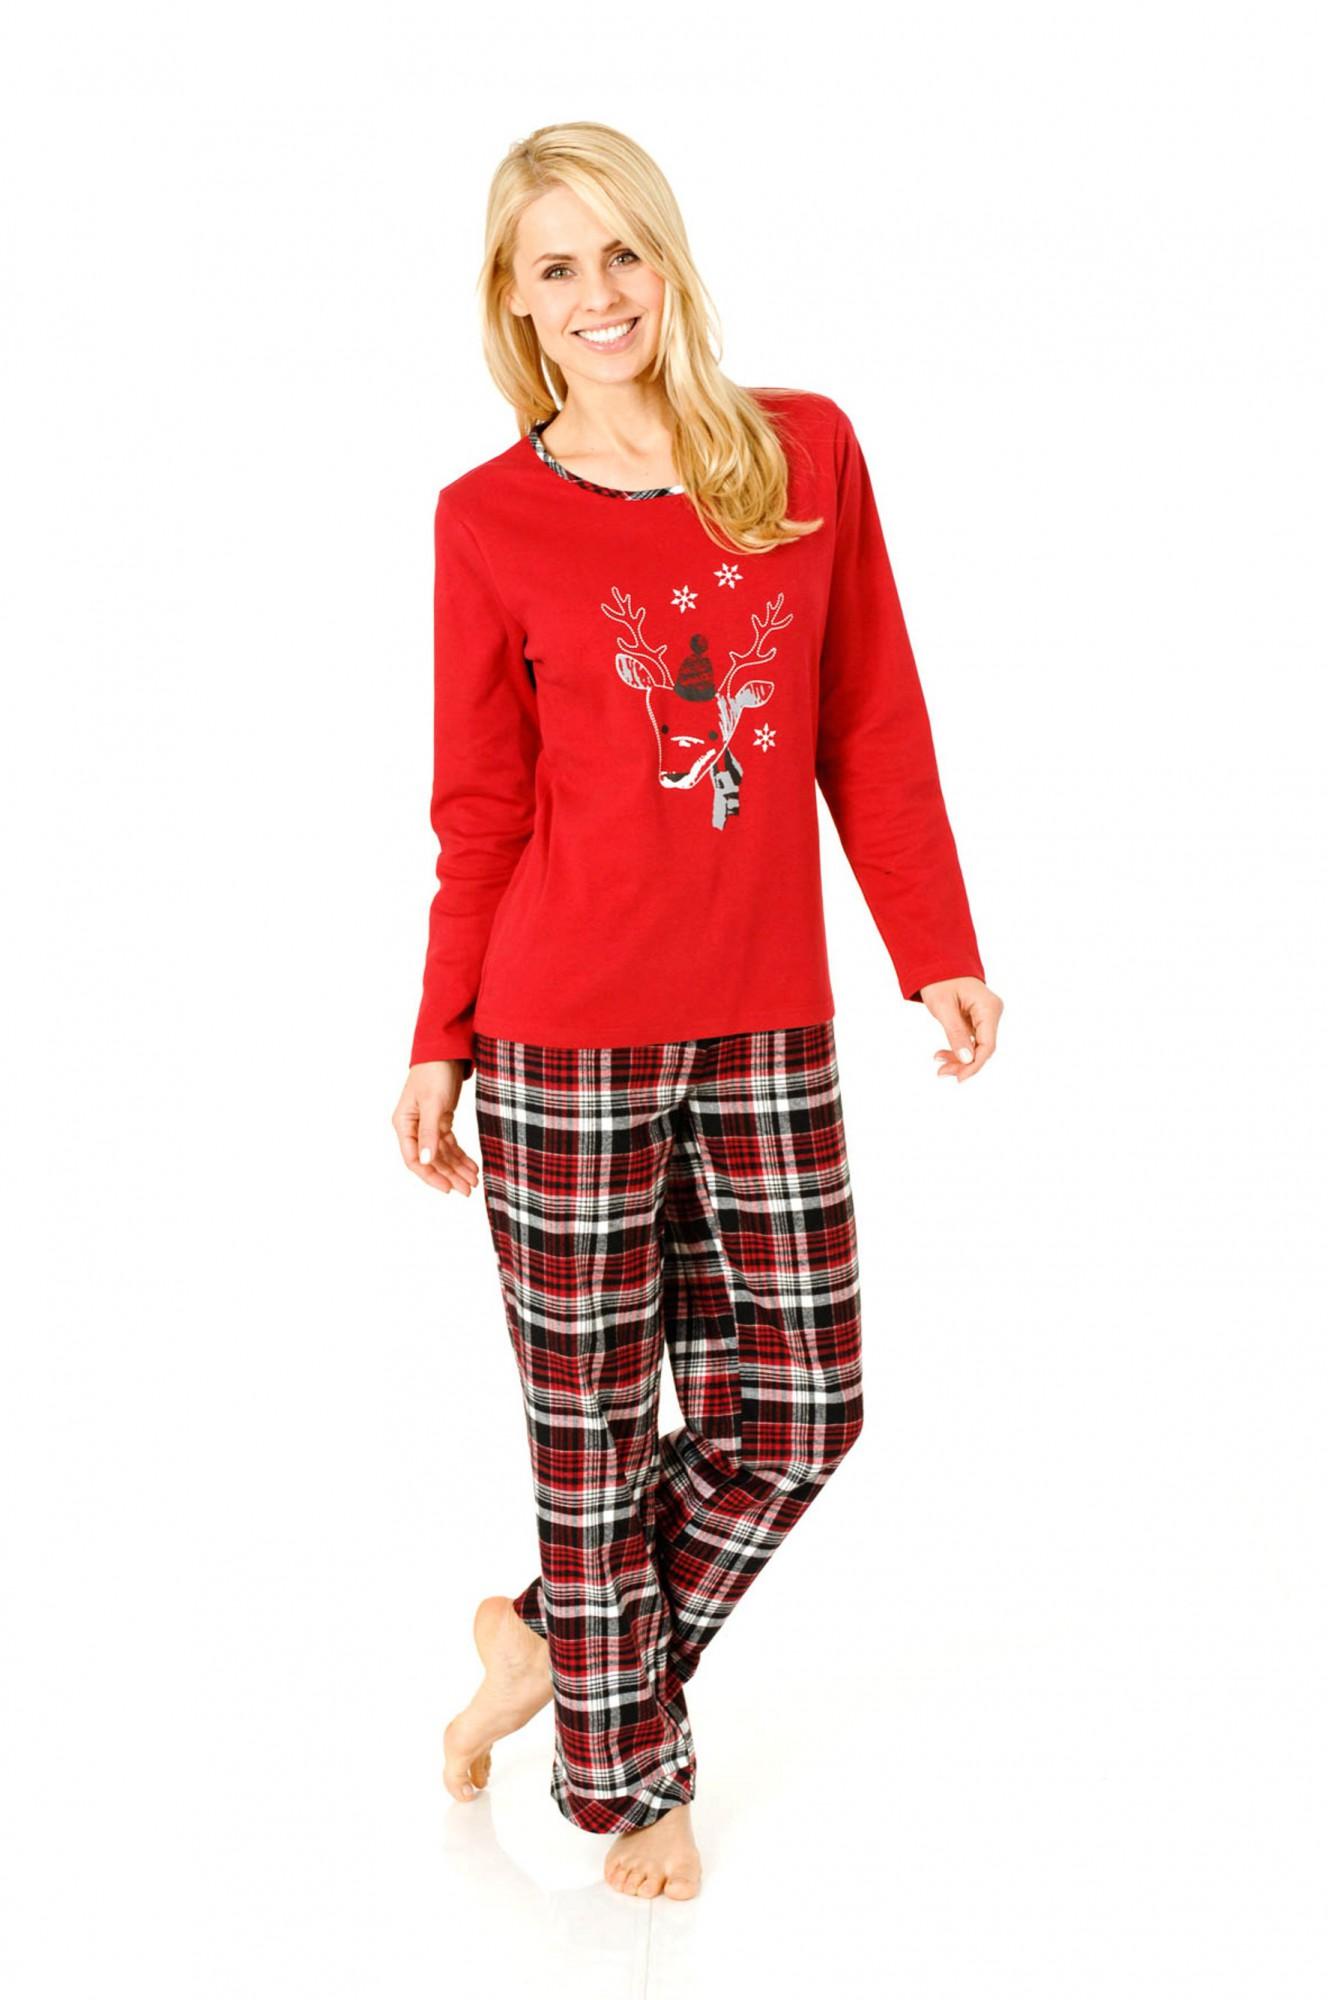 Damen Flanell Pyjama Mix & Match, Flanellhose, Top Interlock, 53404 – Bild 1